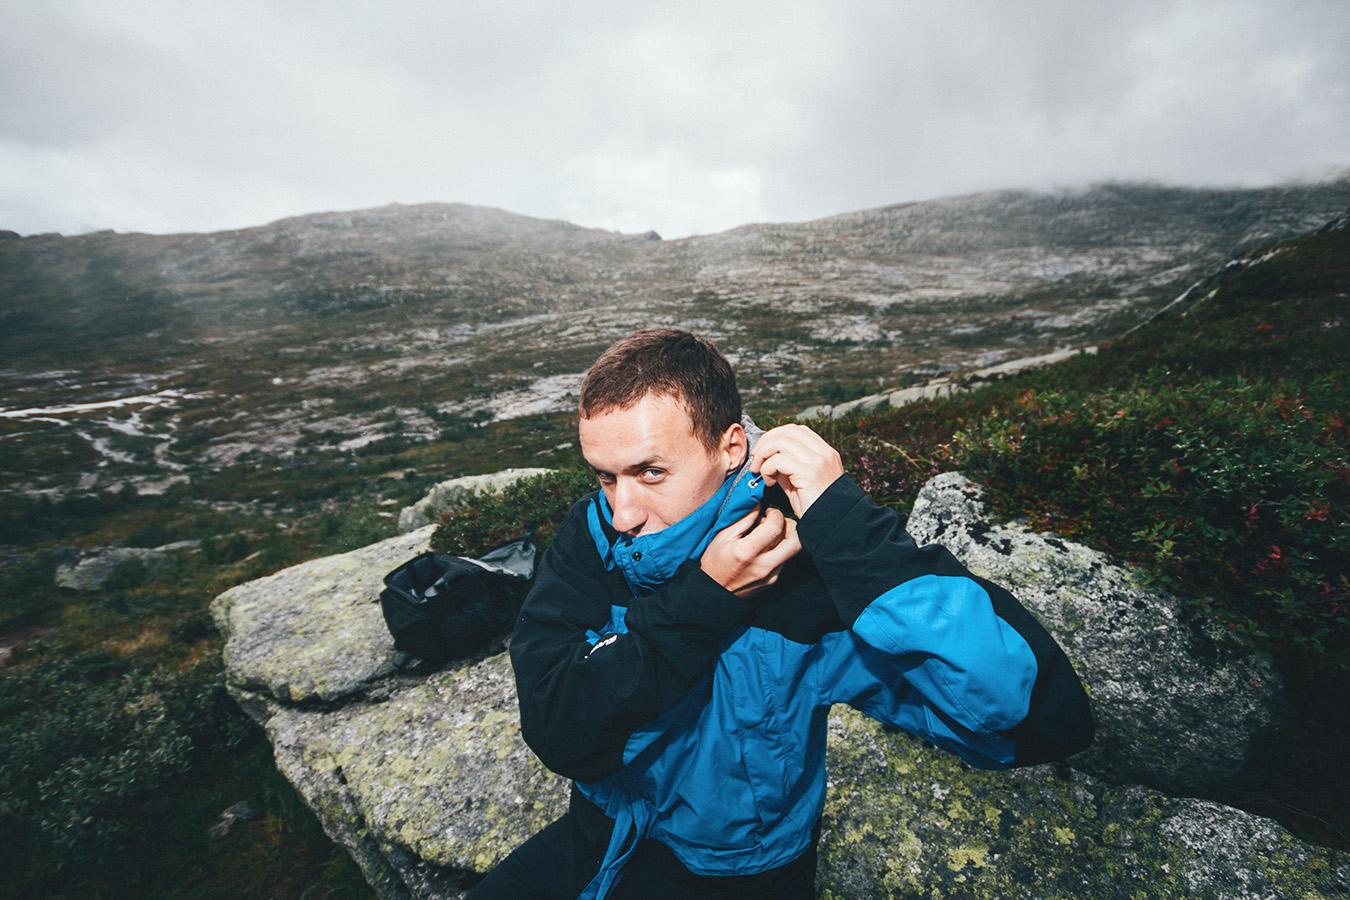 norweskie szlaki, szlak na Trolltungę